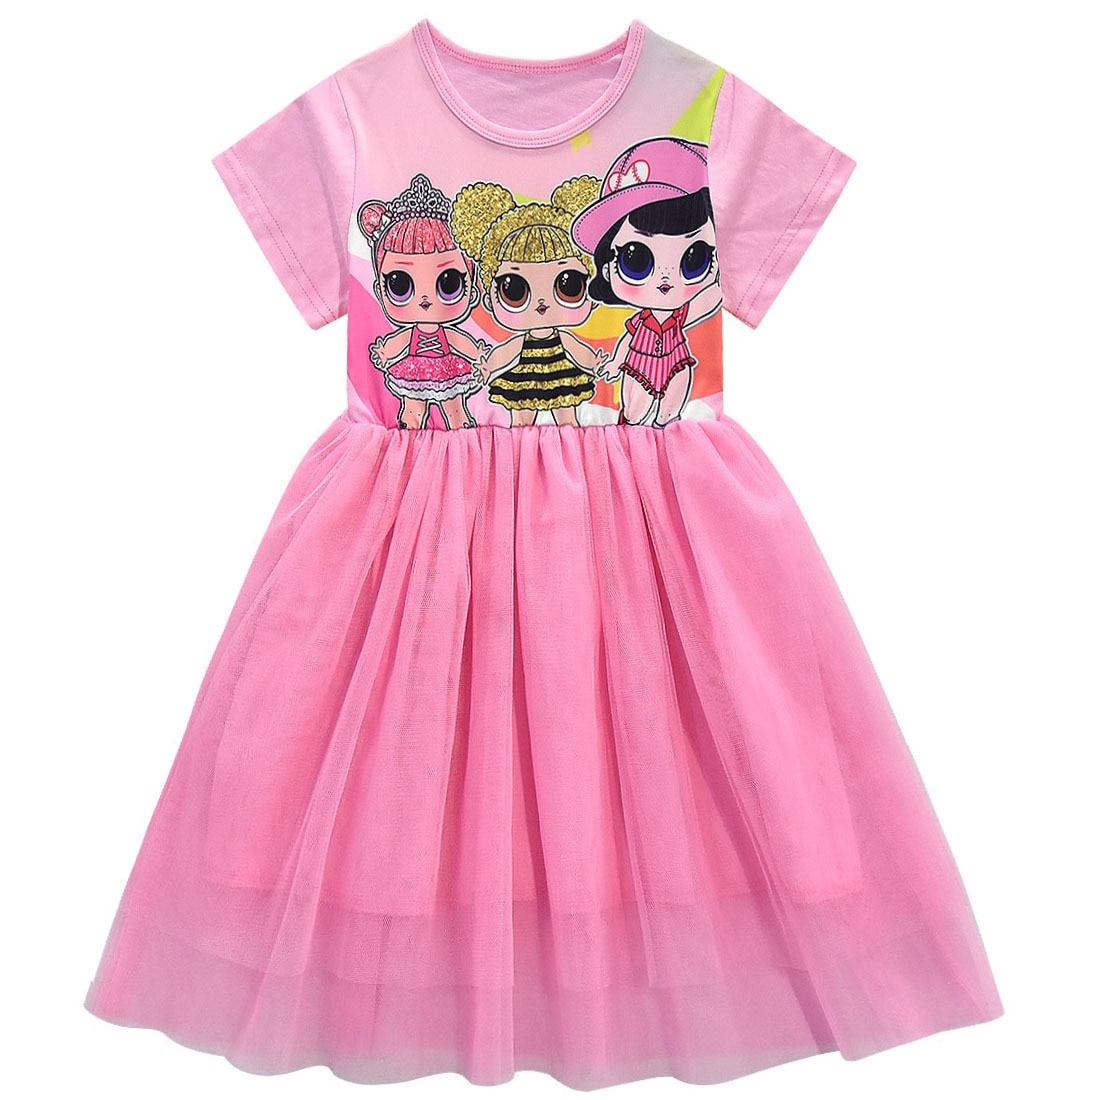 Girls Lol Dress Toddler Baby Lol Doll Clothes Kids Cartoon Print Princess Dress Children Short Sleeve Birthday Vestido for Girl 6